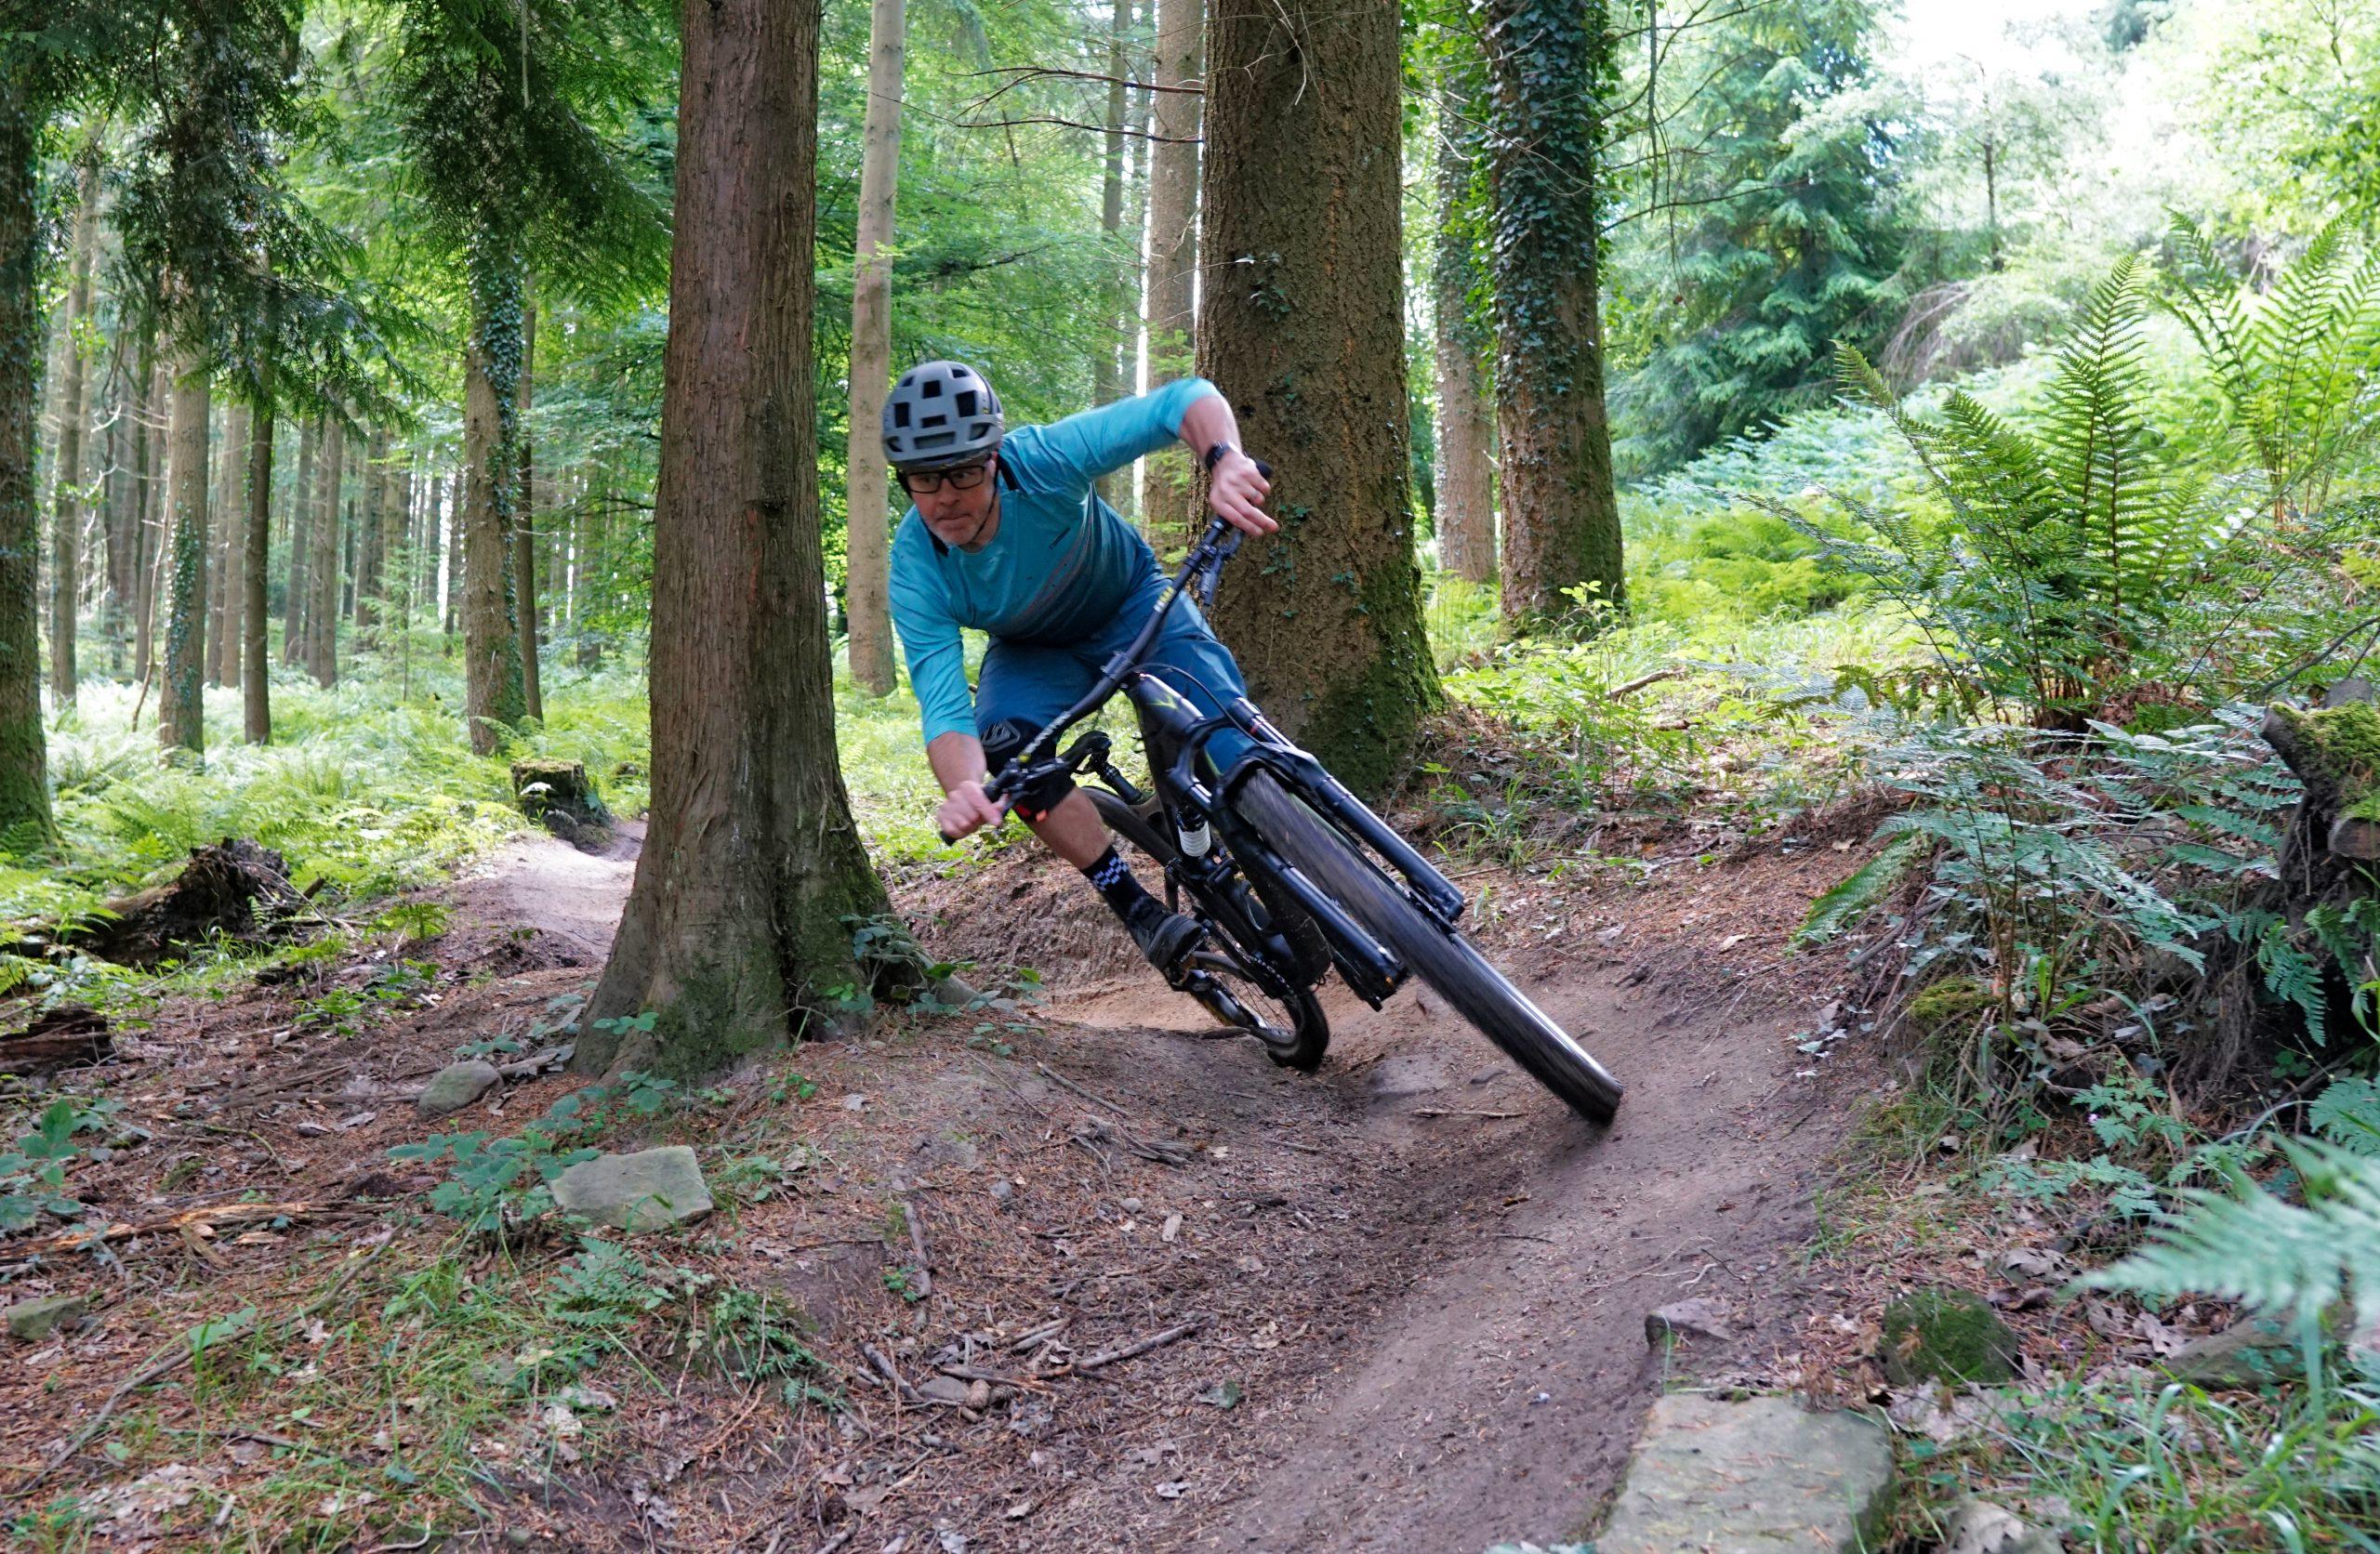 Wye Valley e-bike